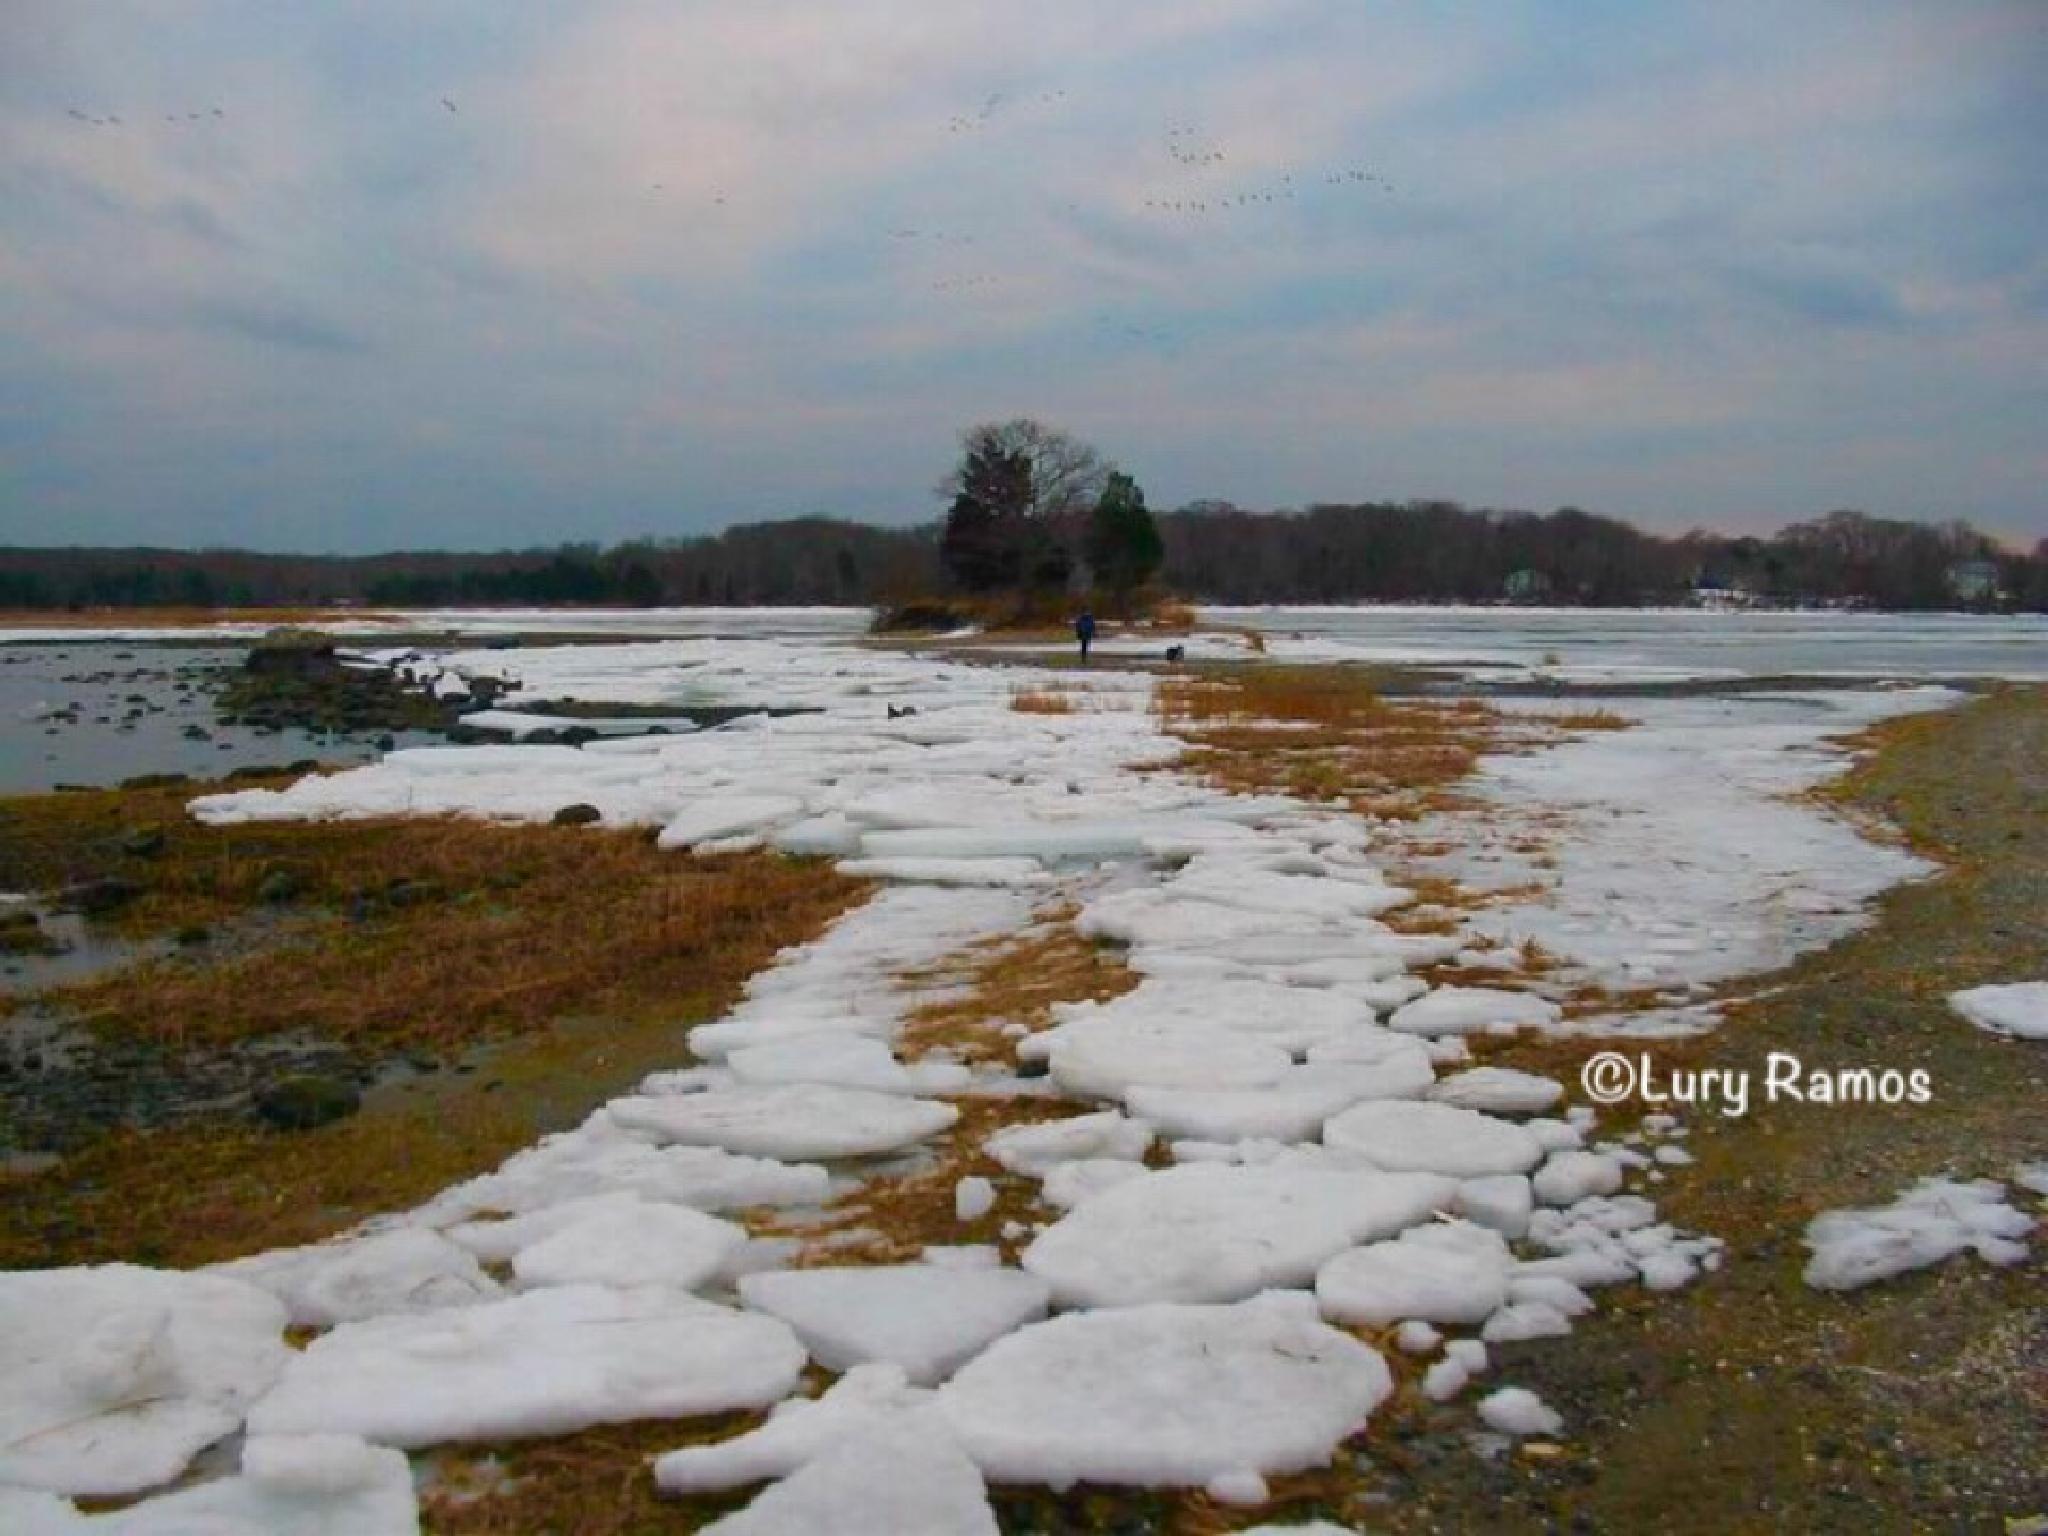 Winter Road by Lury Ramos